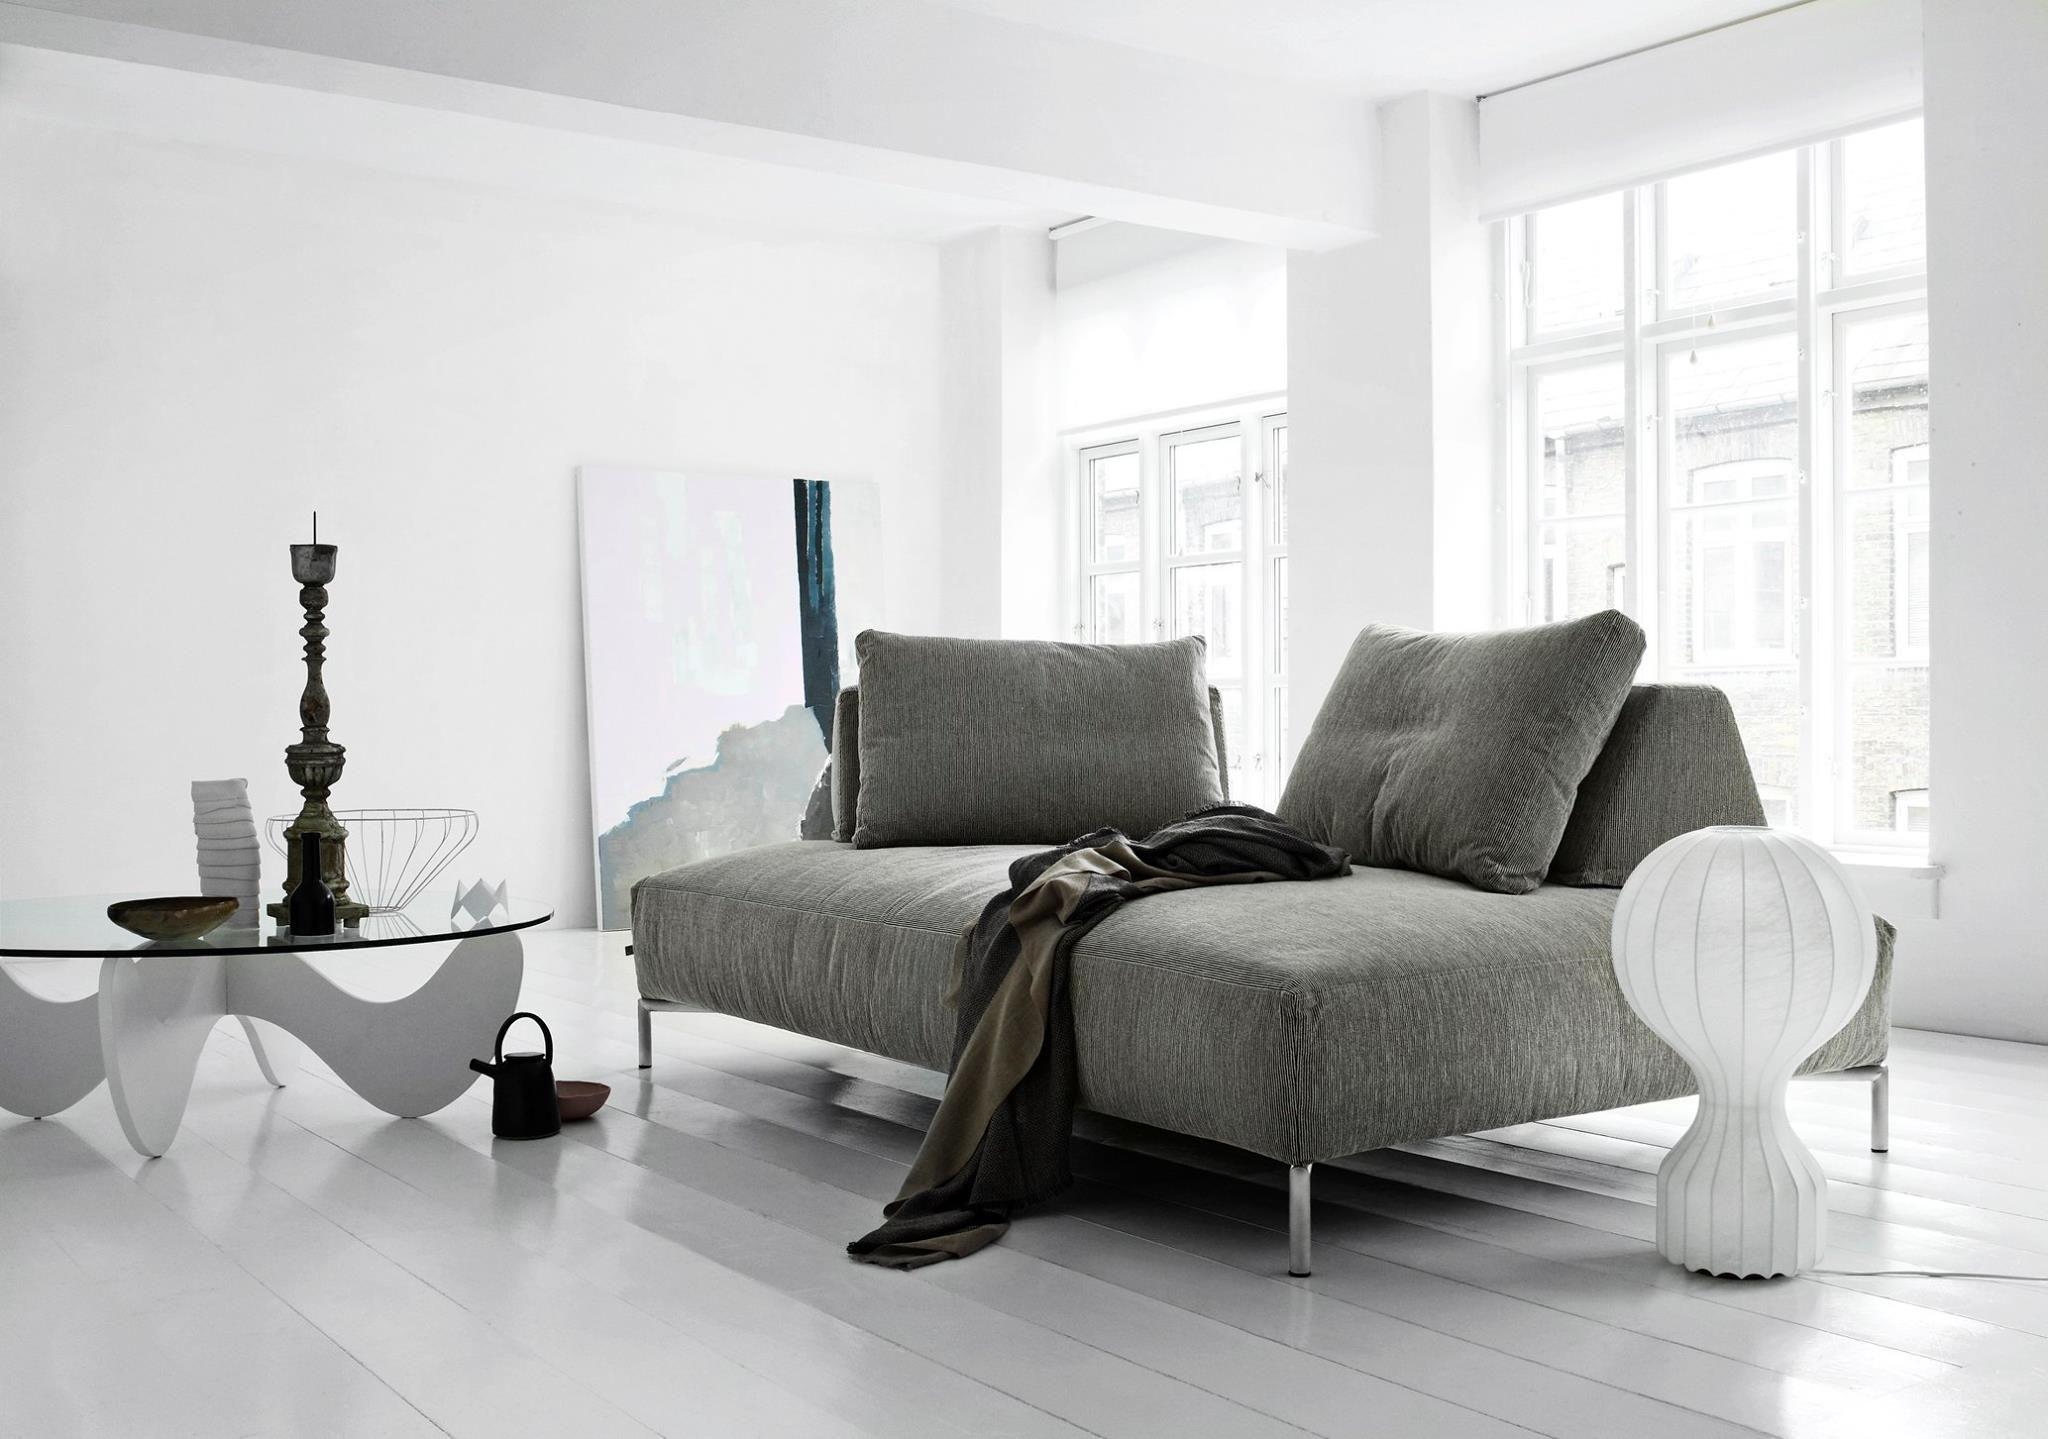 Scandinavian Homewares In Singapore Travelshopa Guides Sofa Eilersen Backless Scandinavian Danish Furniture Moder In 2020 Playground Sofa Contemporary Sofa Furniture